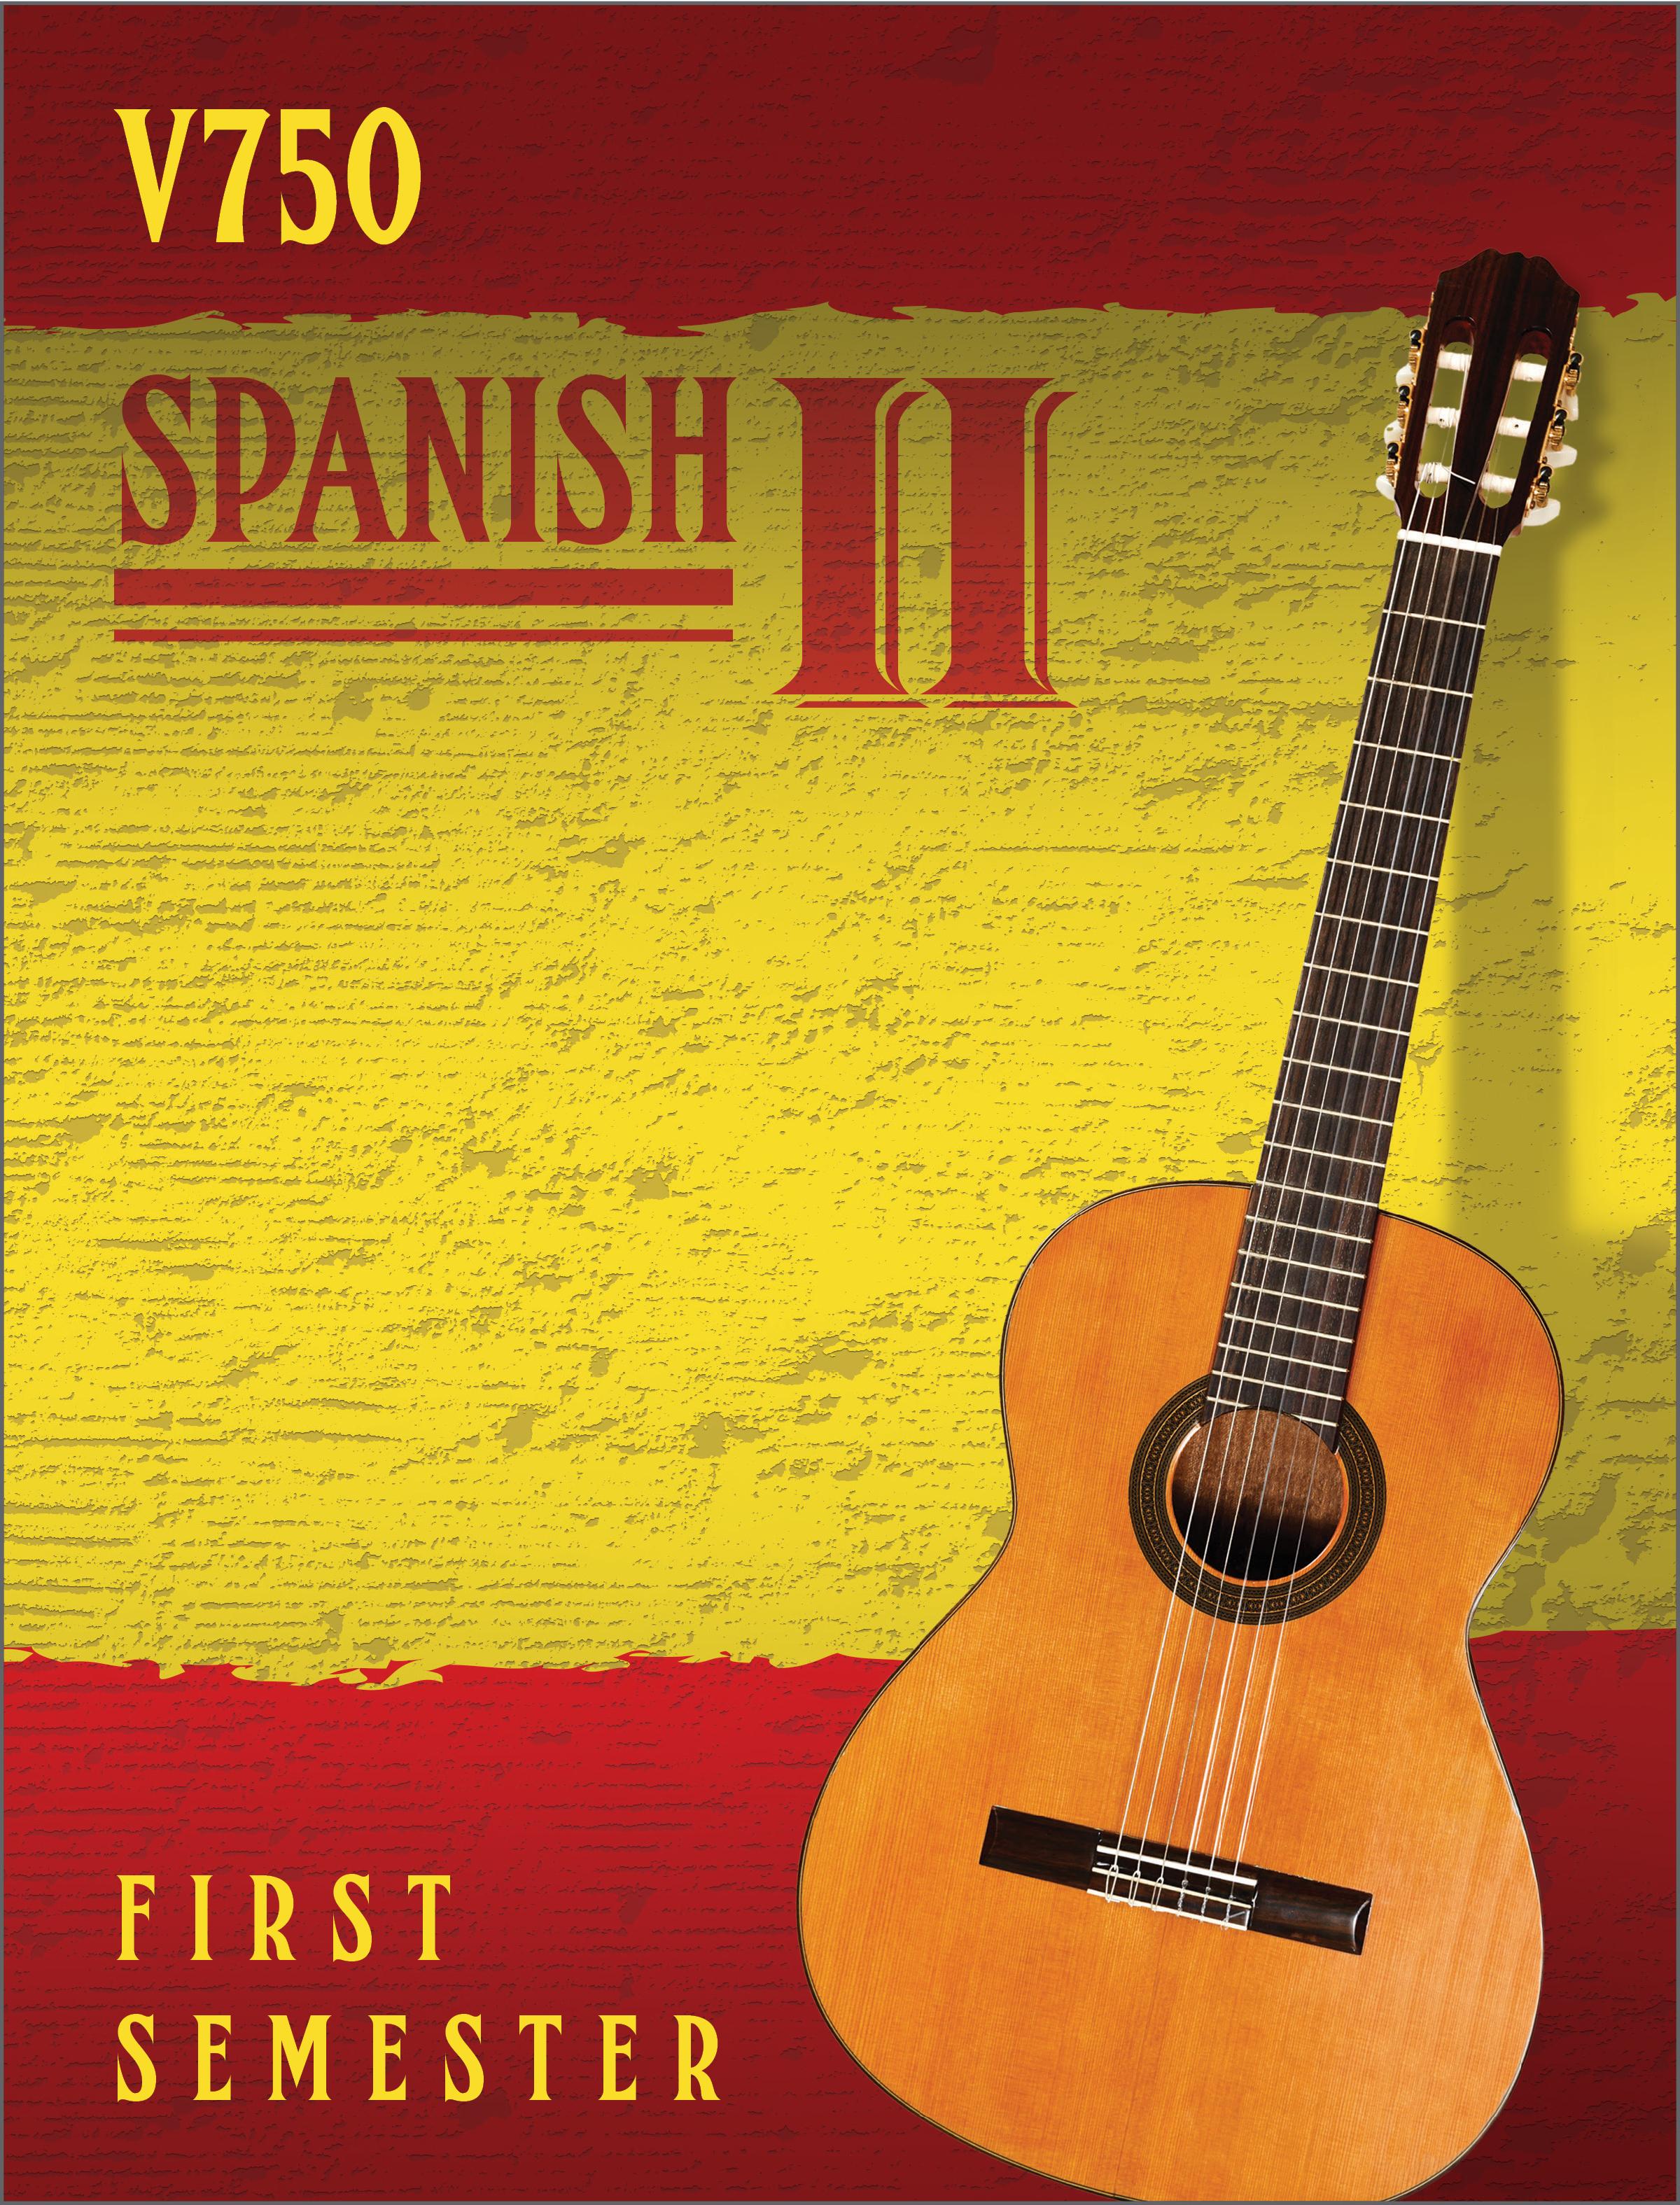 The LFBC Spanish II Program